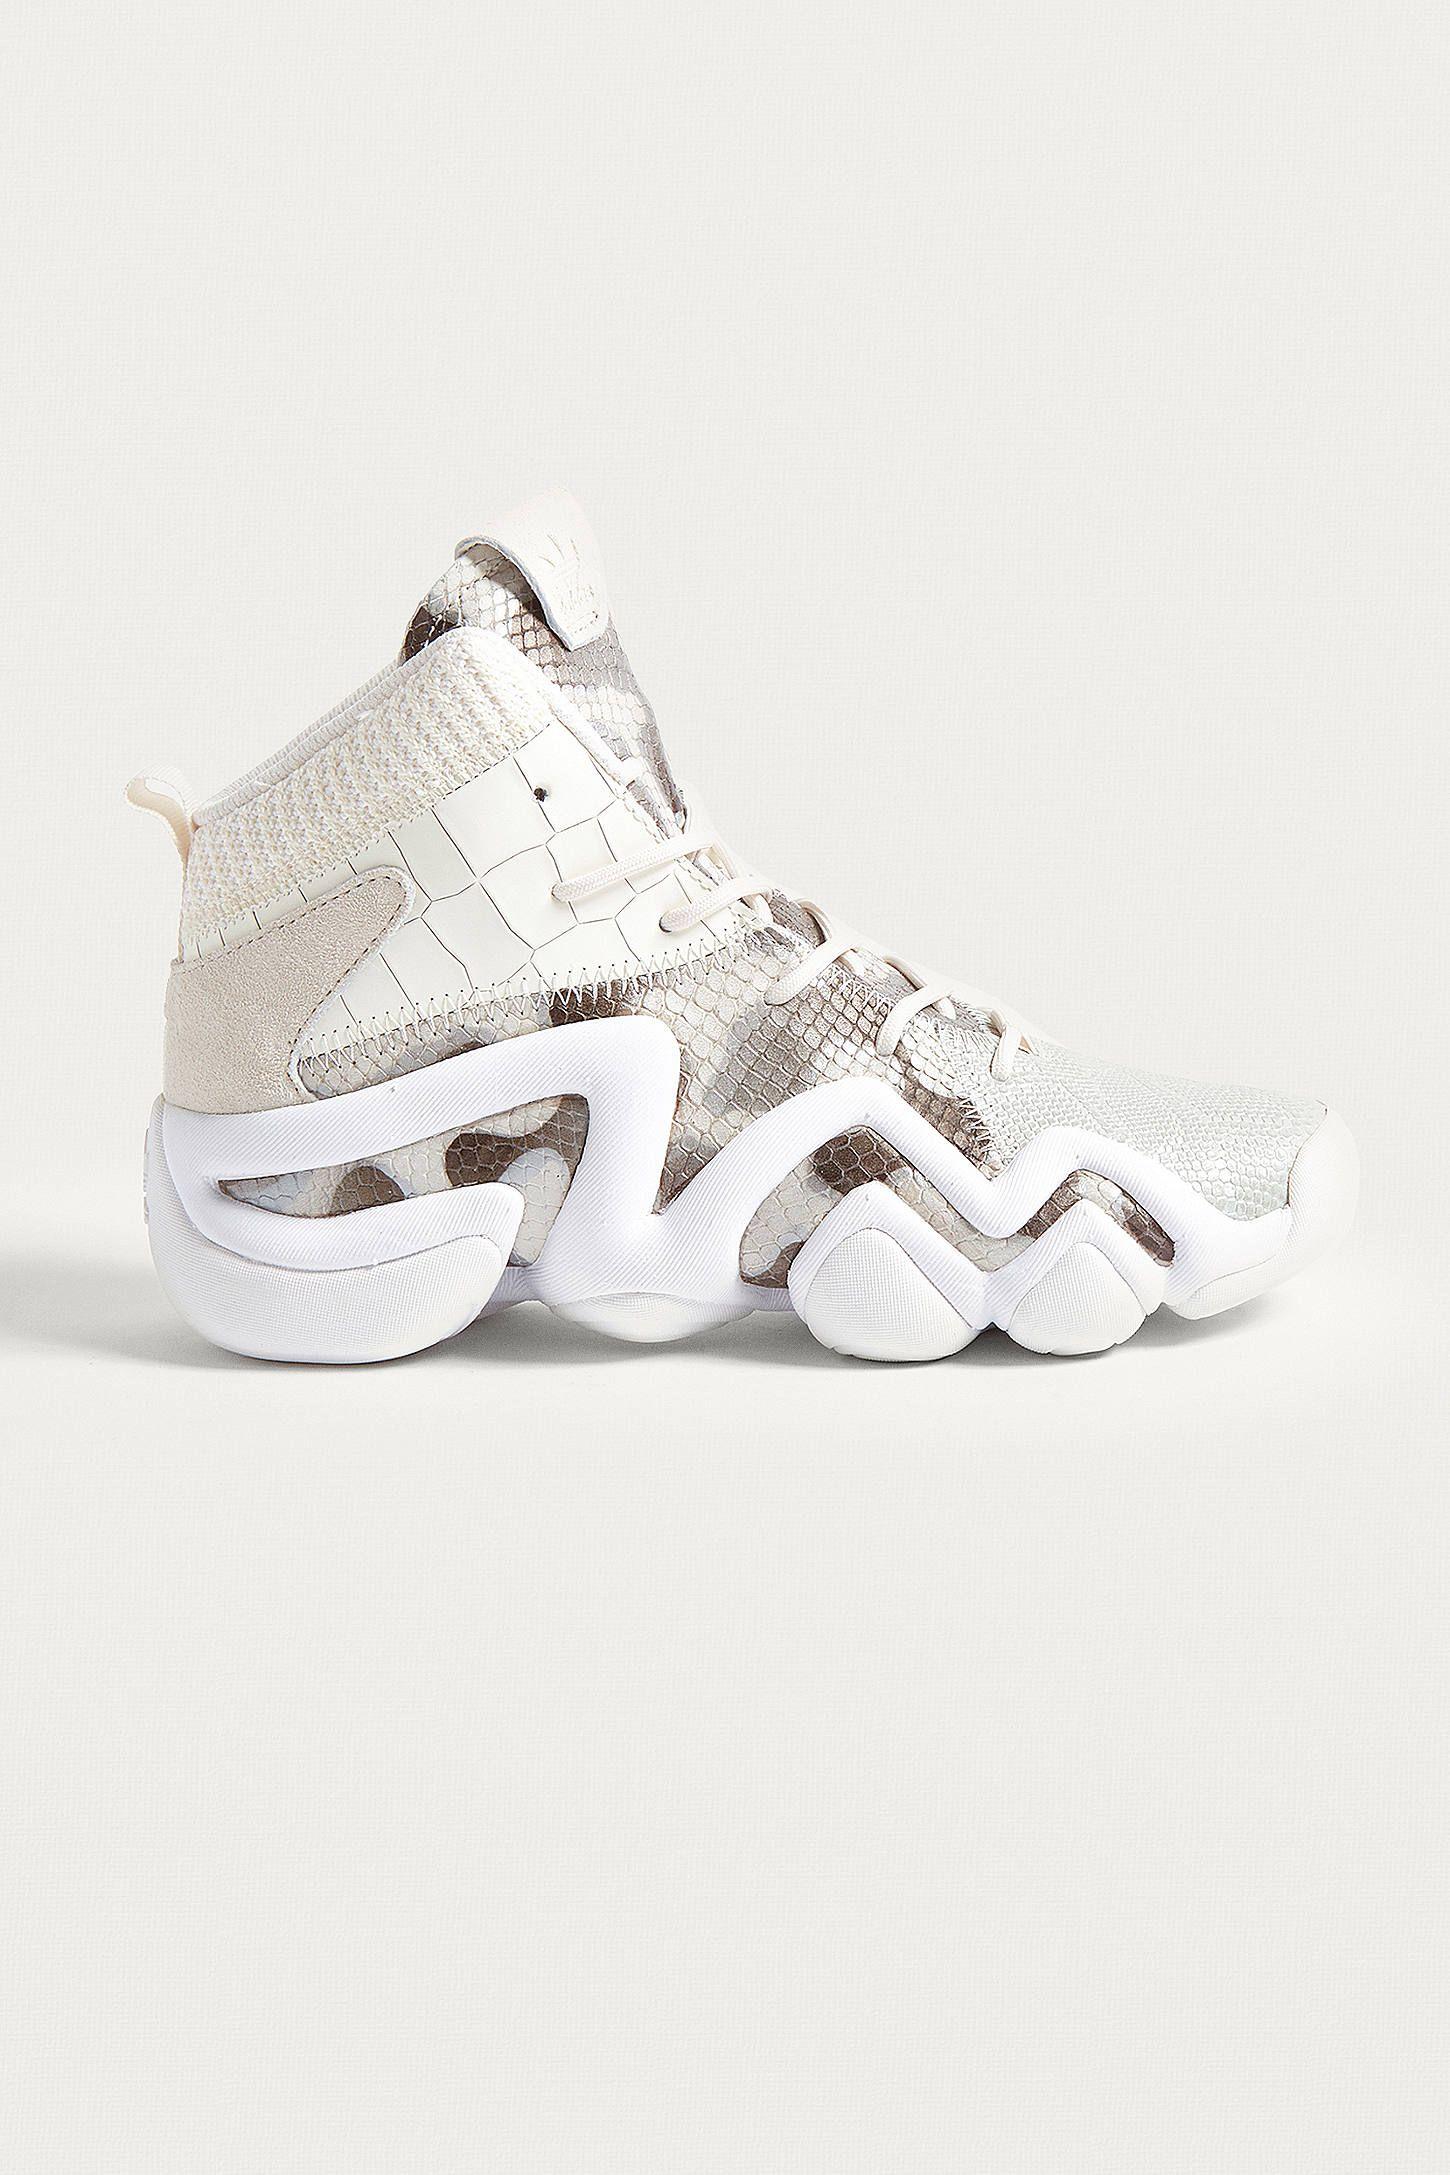 1a77252d1200b adidas Originals Crazy 8 Primeknit Trainers | Adidas women ...